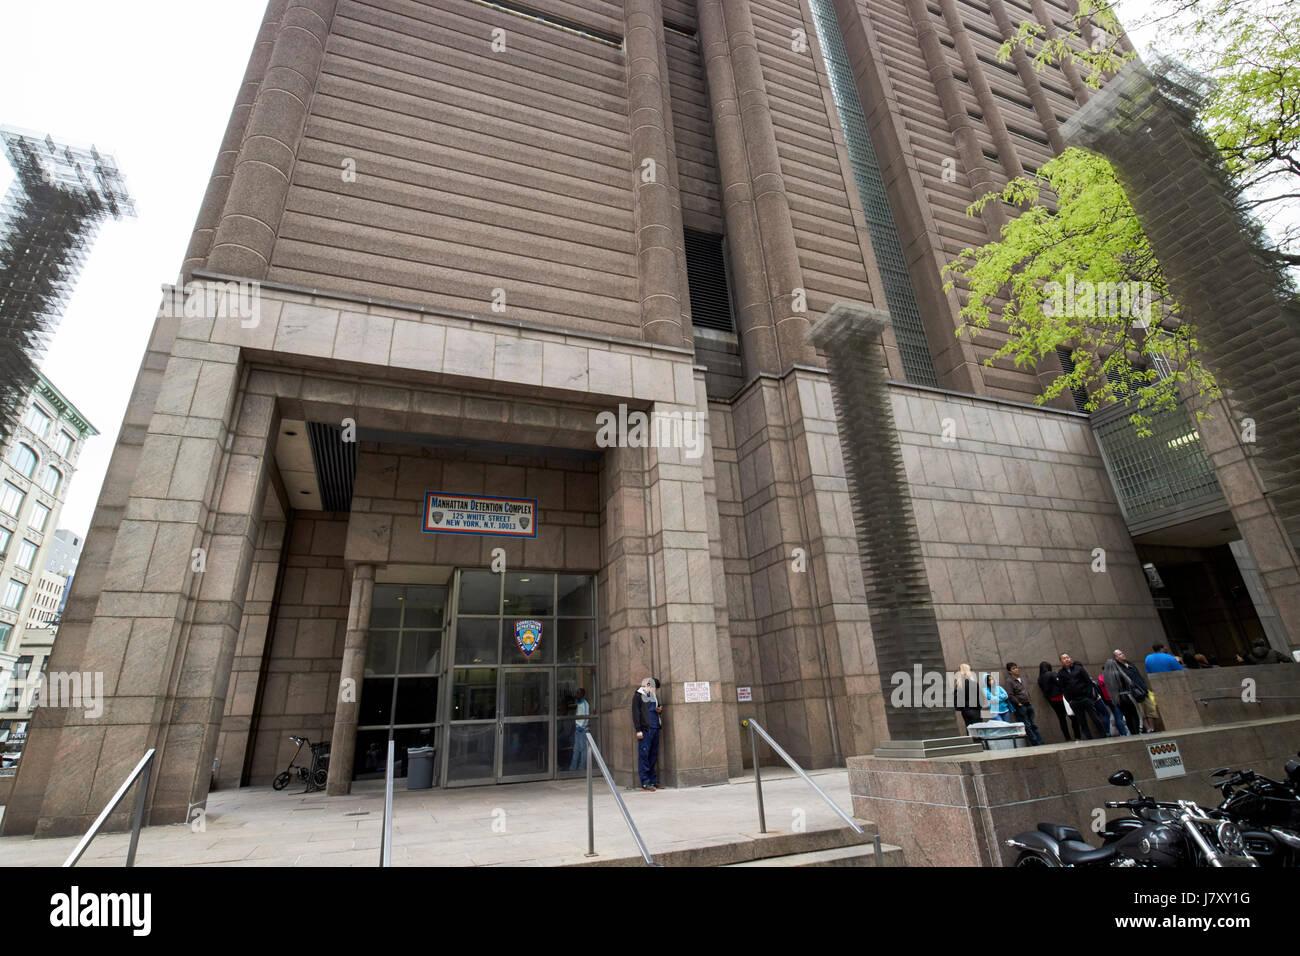 manhattan detention complex metropolitan correction center manhattan New York City USA - Stock Image